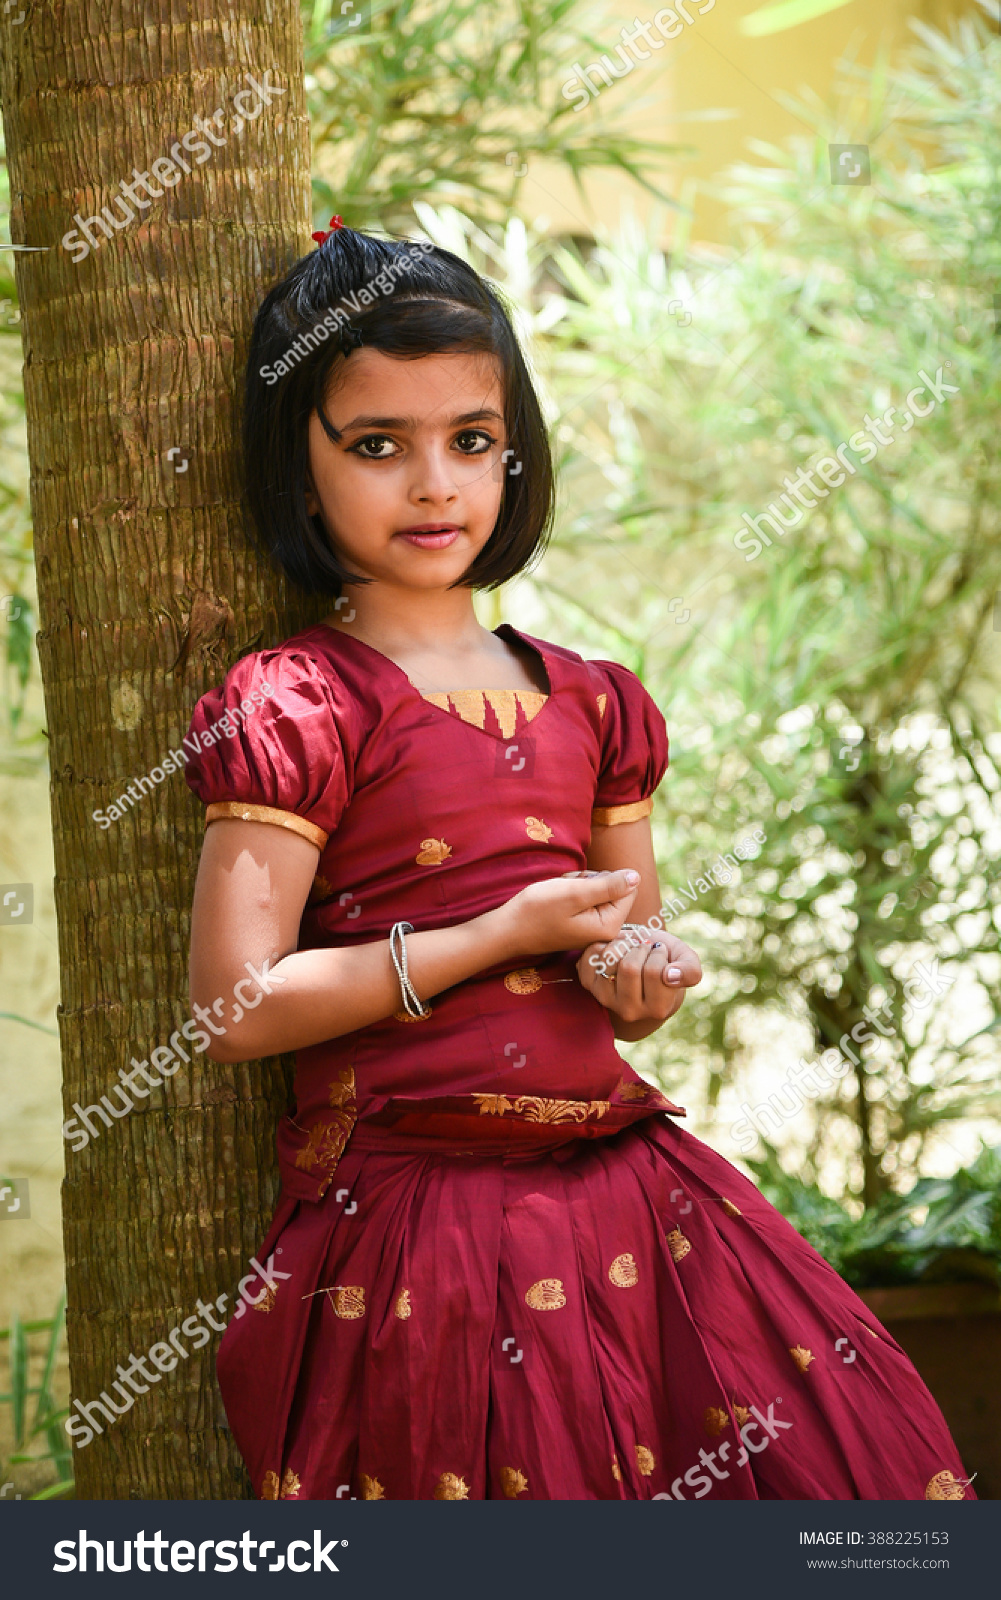 87633a0fb0 Young Indian girl wearing traditional dress for Onam, Vishu Kerala India .  Asian child. Beautiful daughter in traditional India sari.